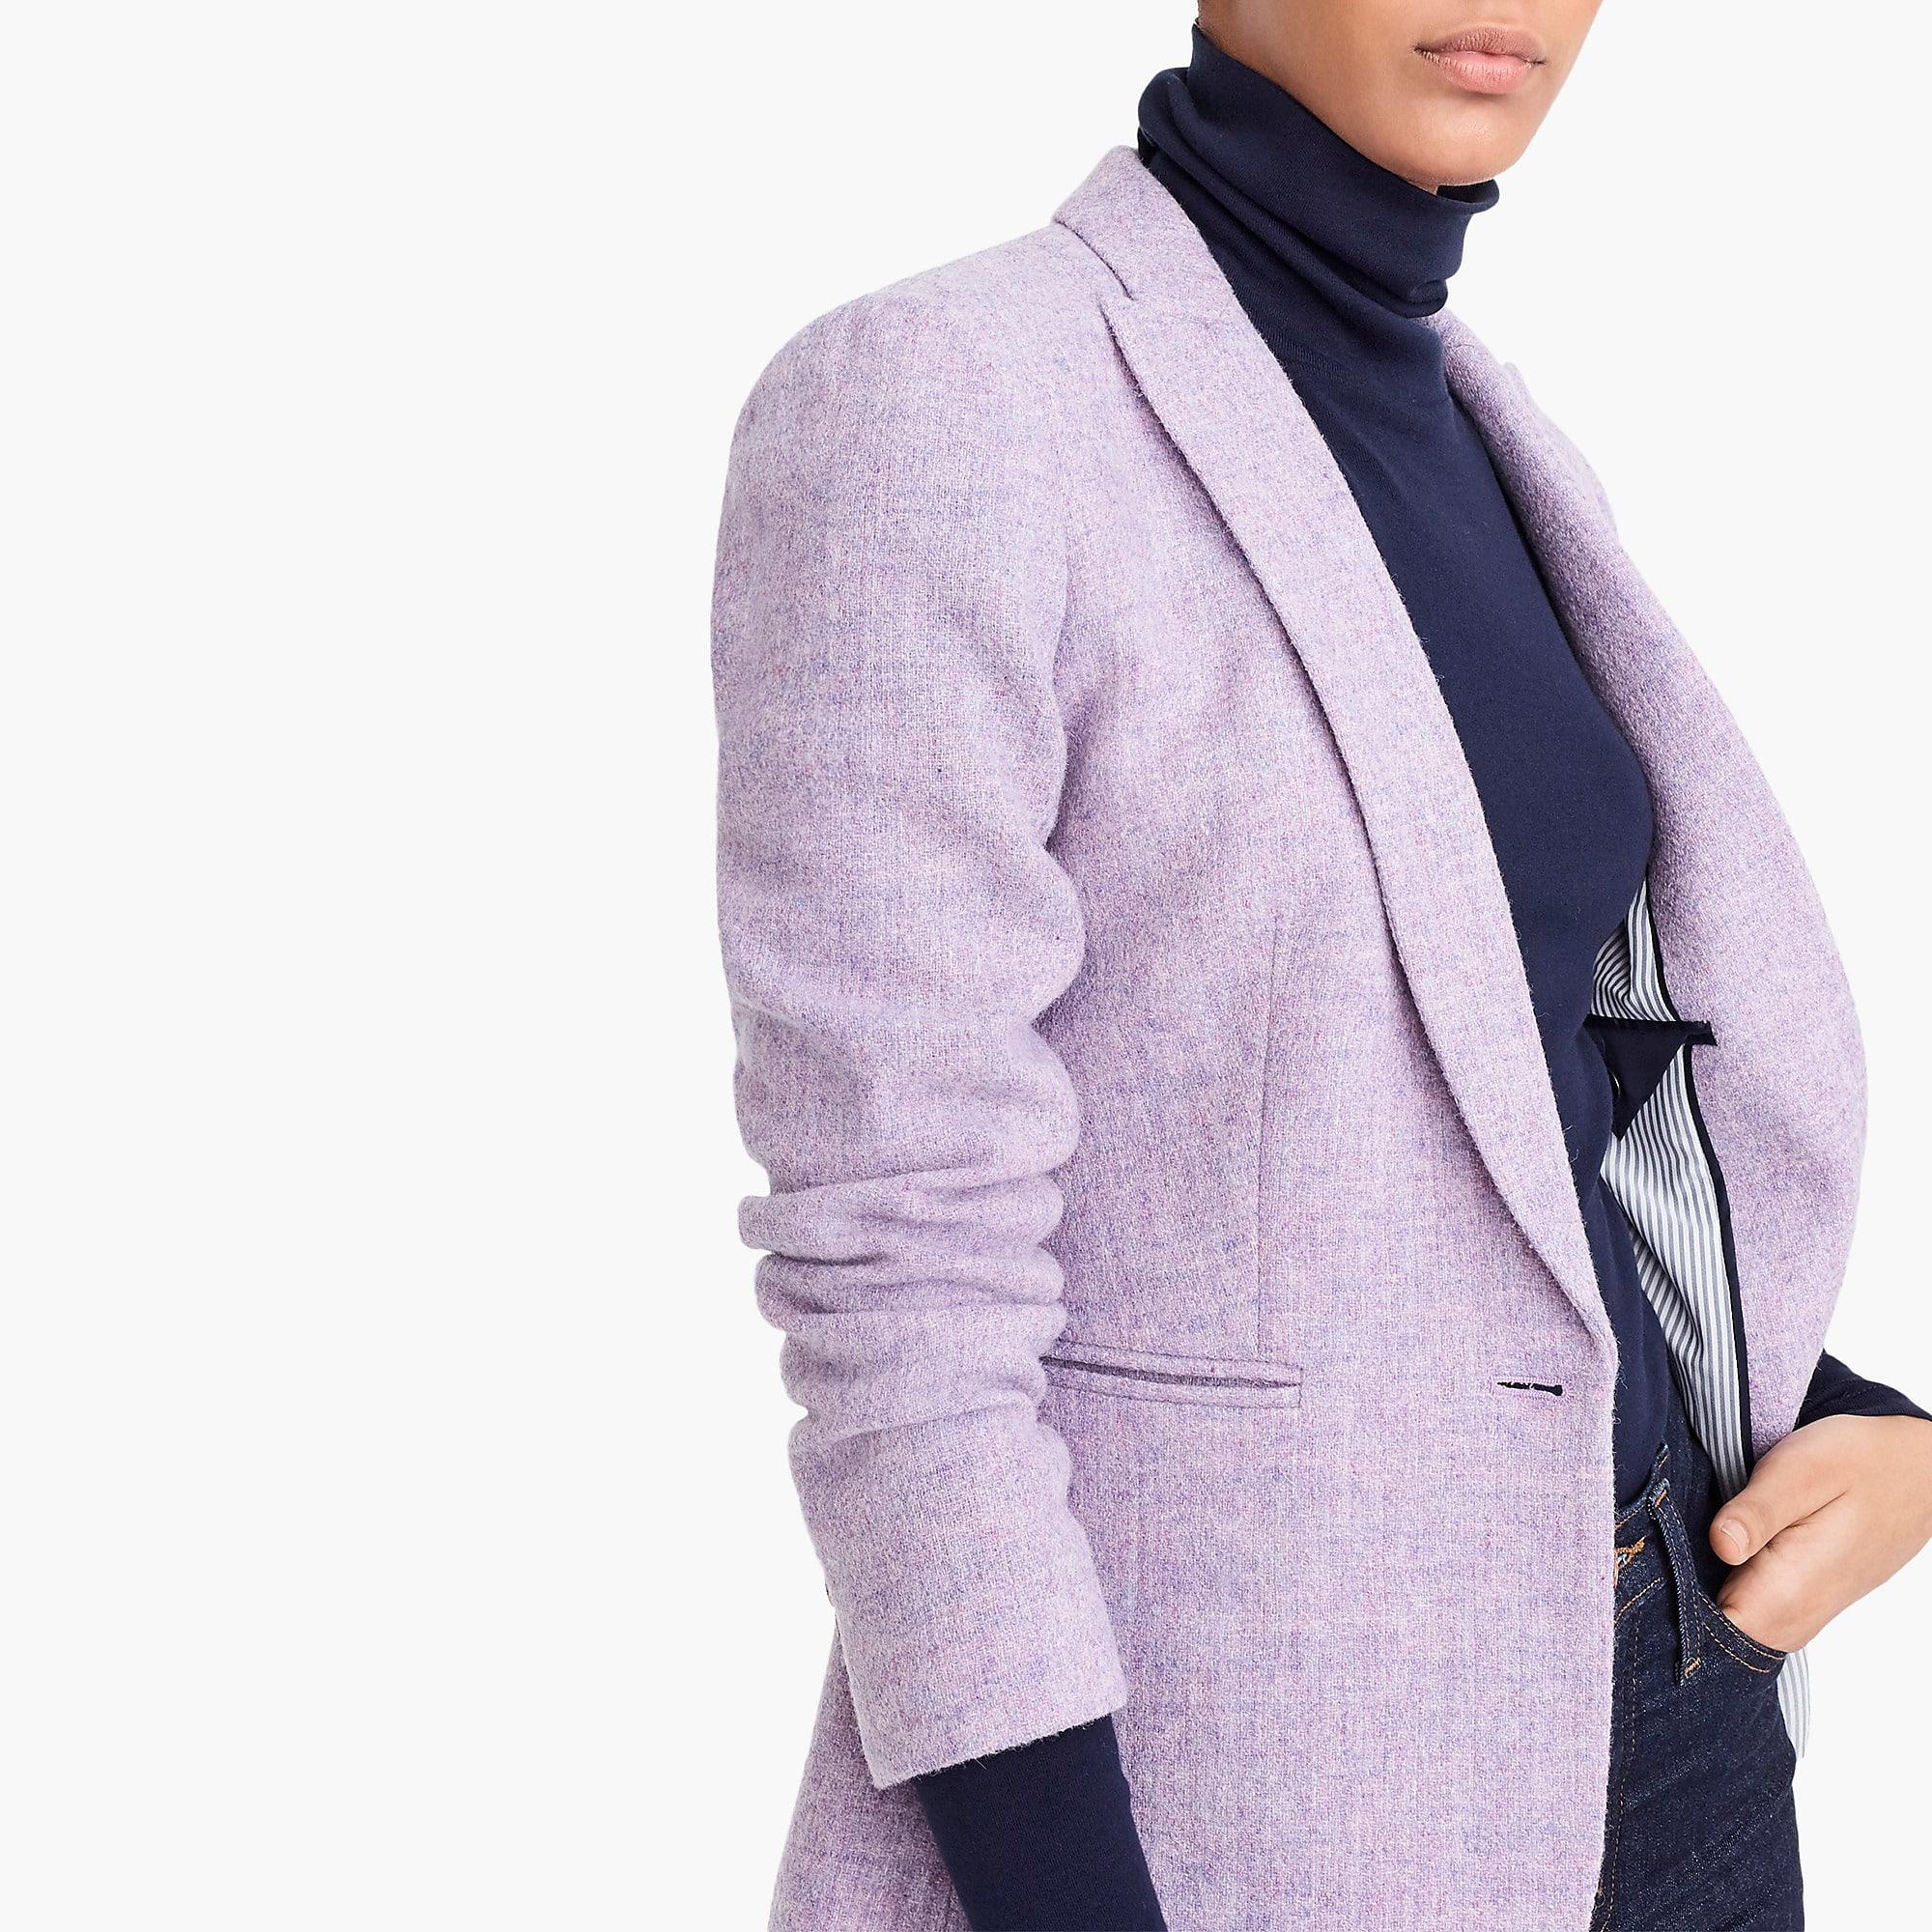 NWT J CREW Women Parke Herringbone Lavender Wool Blazer Jacket P8 Purple  K3074